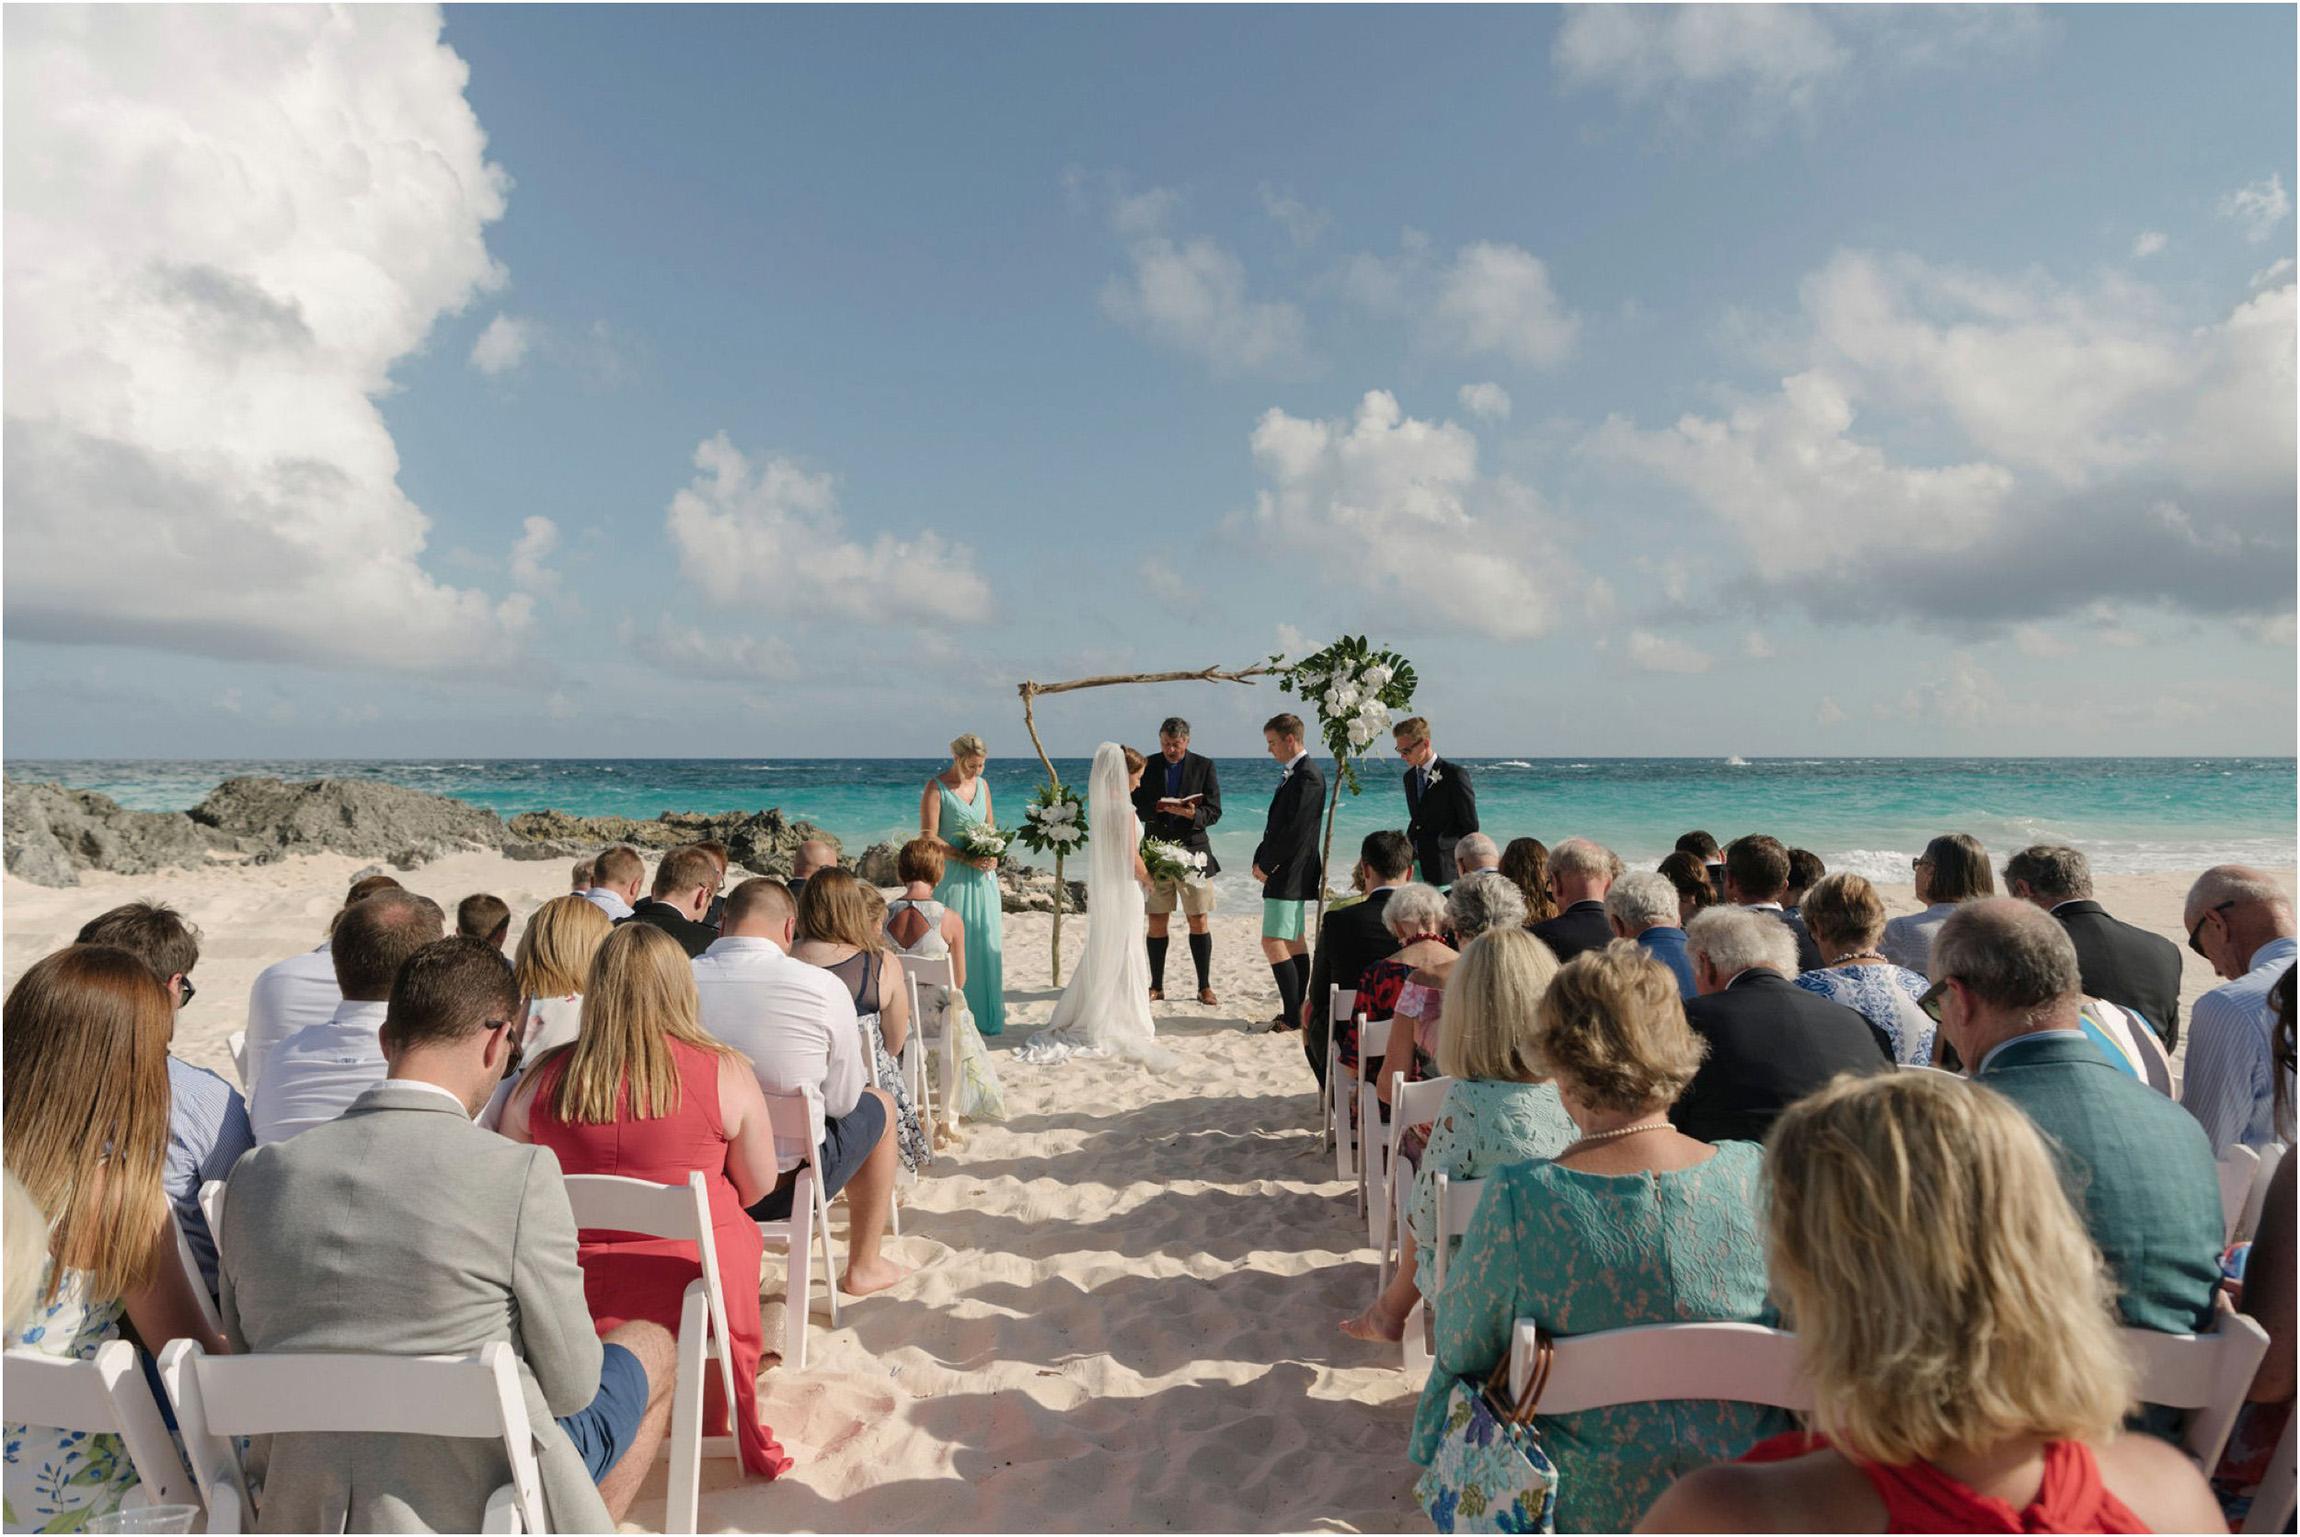 ©FianderFoto_Bermuda Wedding Photographer_Mid Ocean_Rachel_Angus_029.jpg